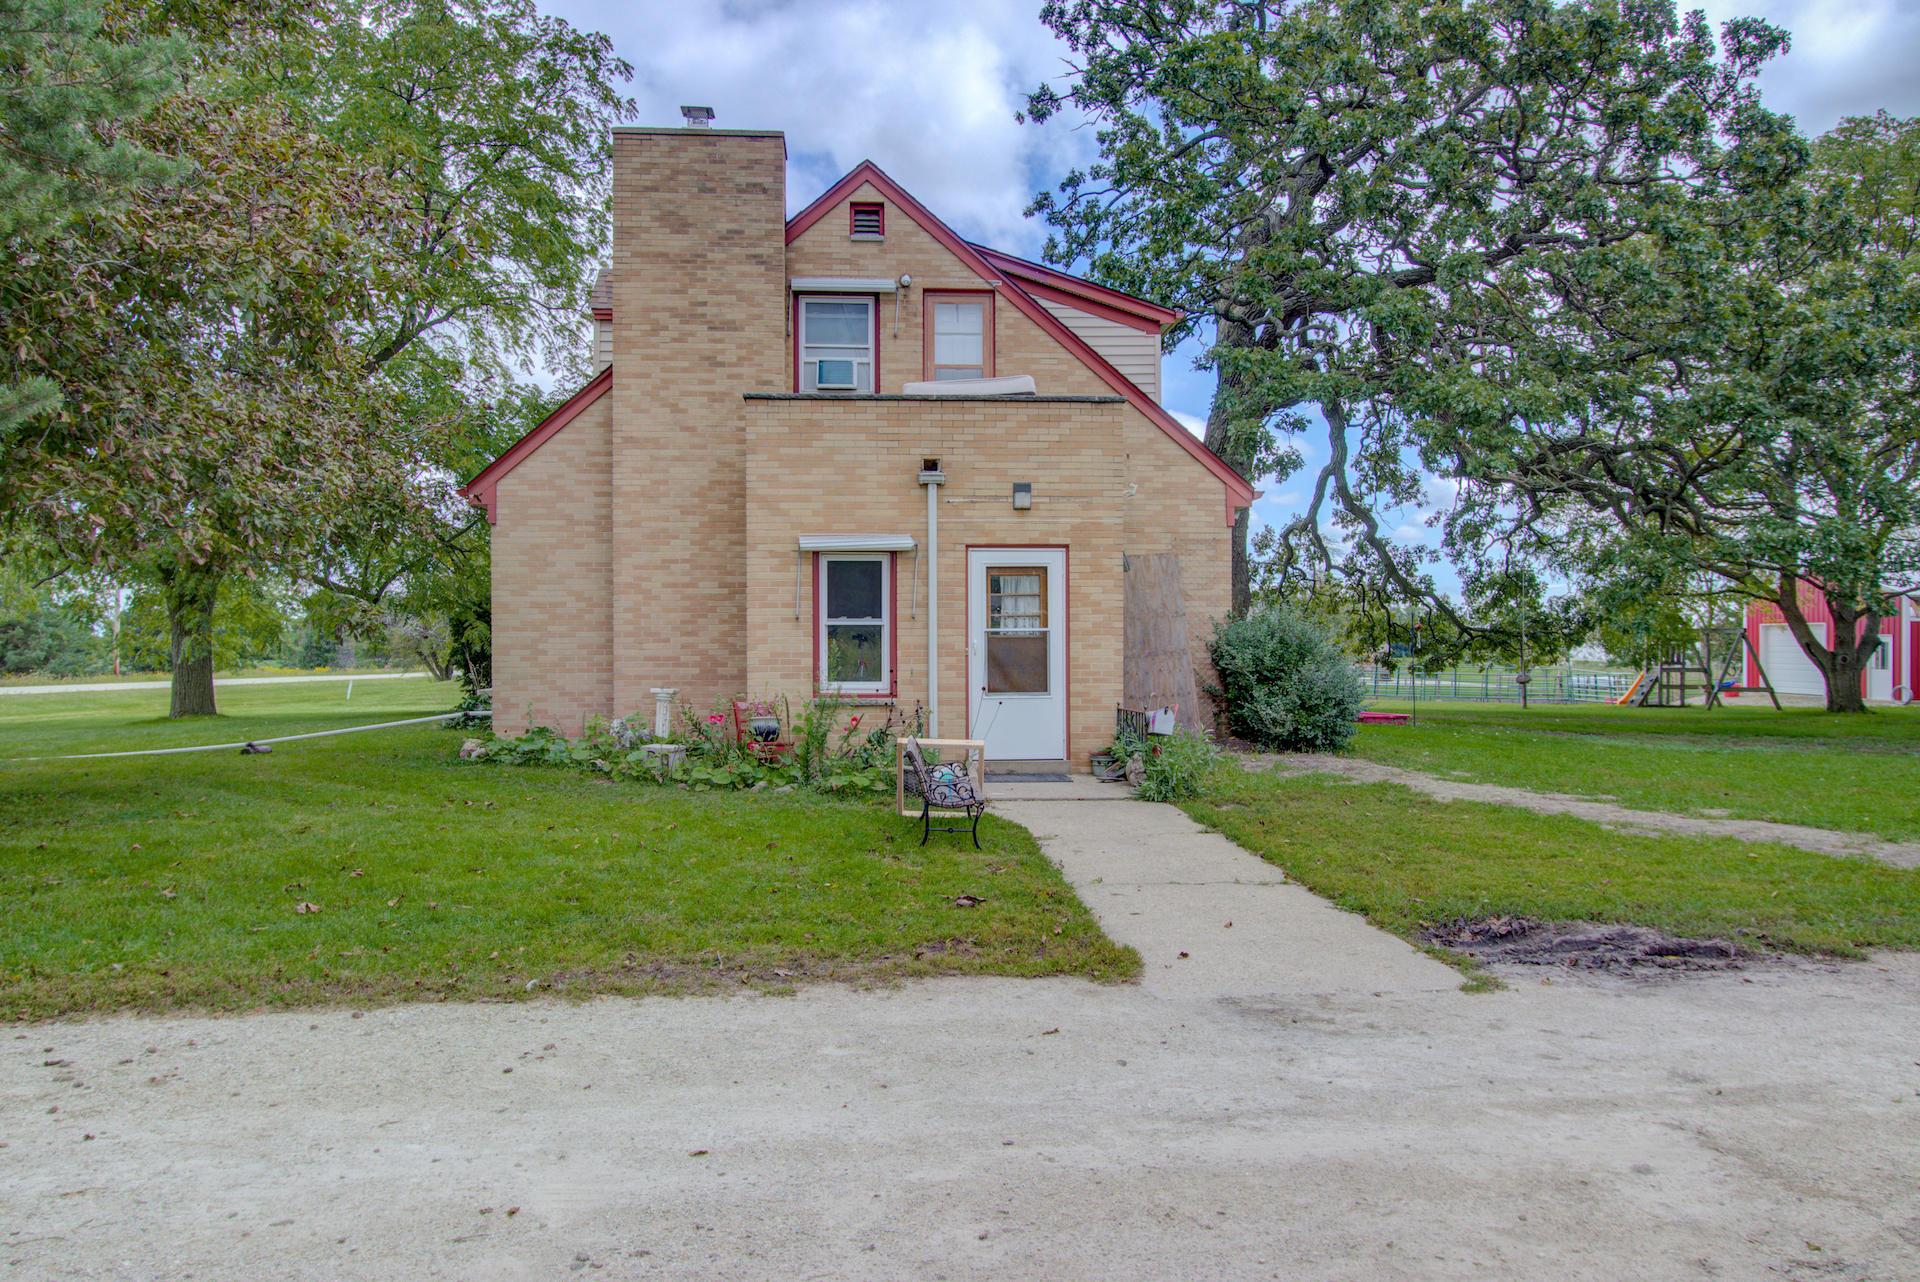 Photo of 14601 Braun Rd, Sturtevant, WI 53177